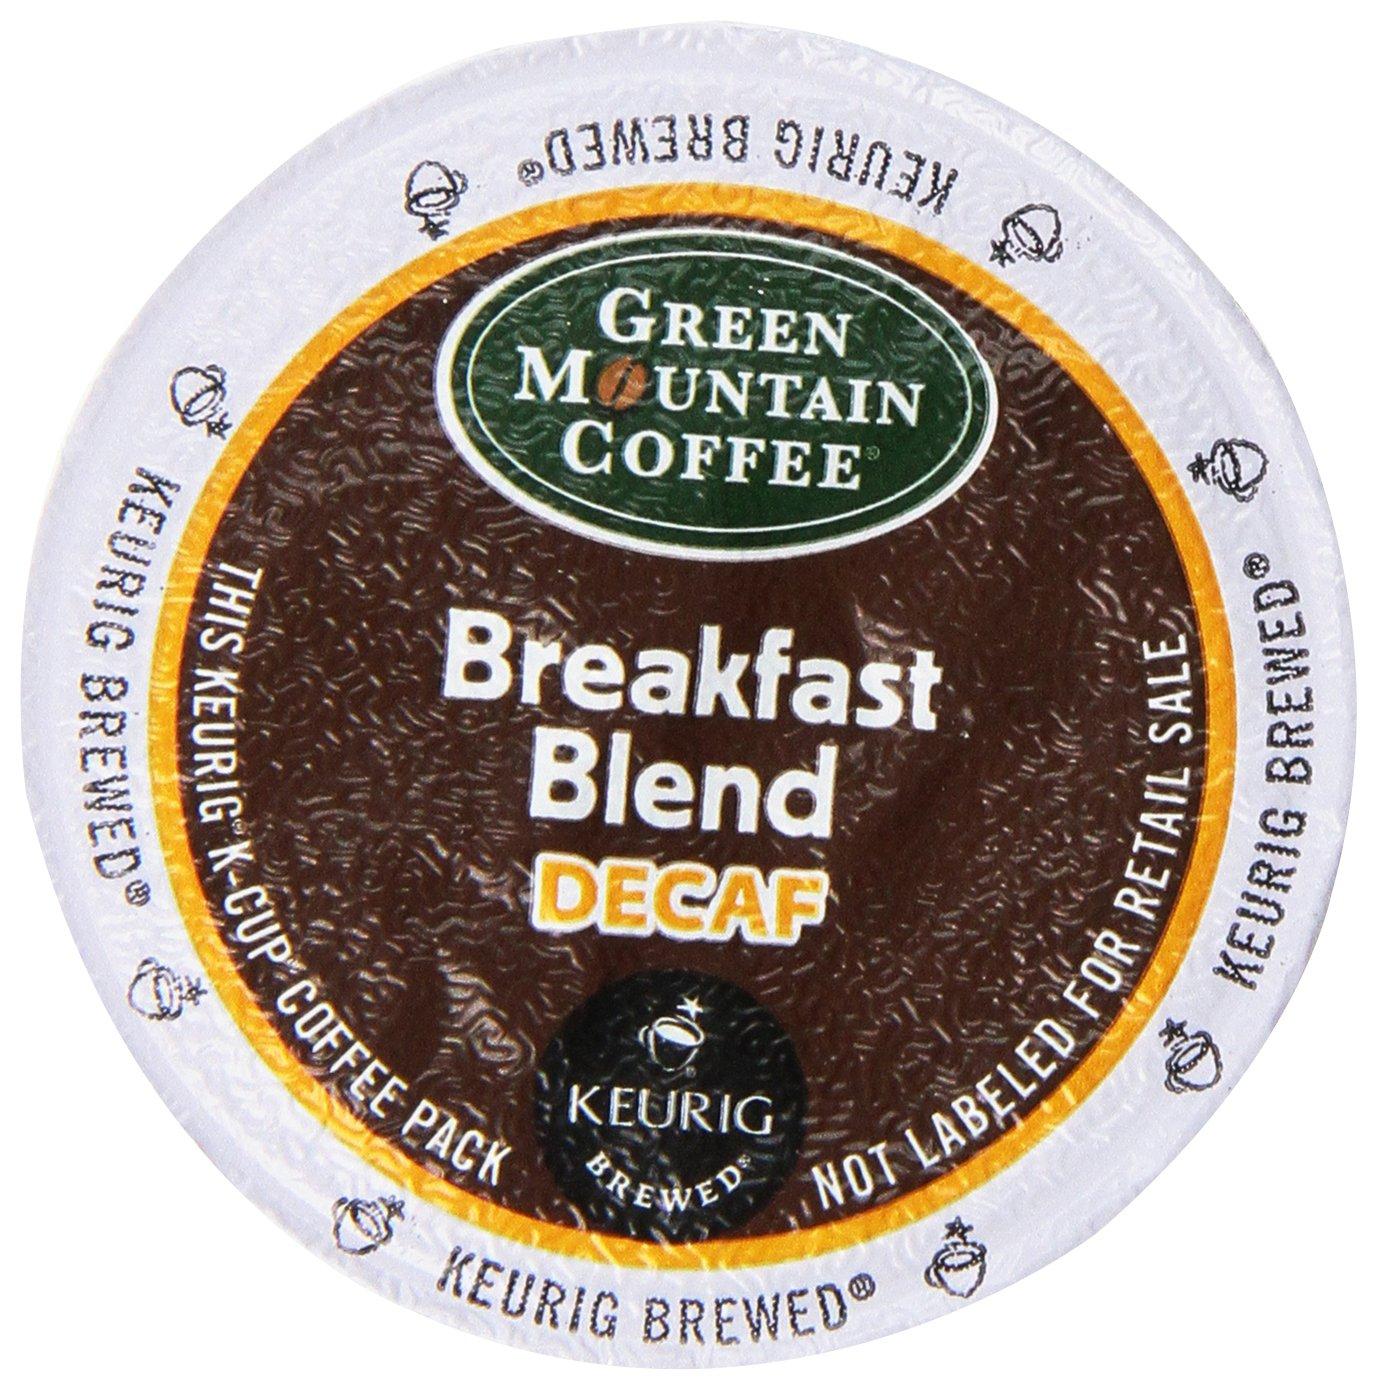 Green Mountain Coffee Decaf Breakfast Blend (Light Roast Coffee) K-Cup Porti.. 14